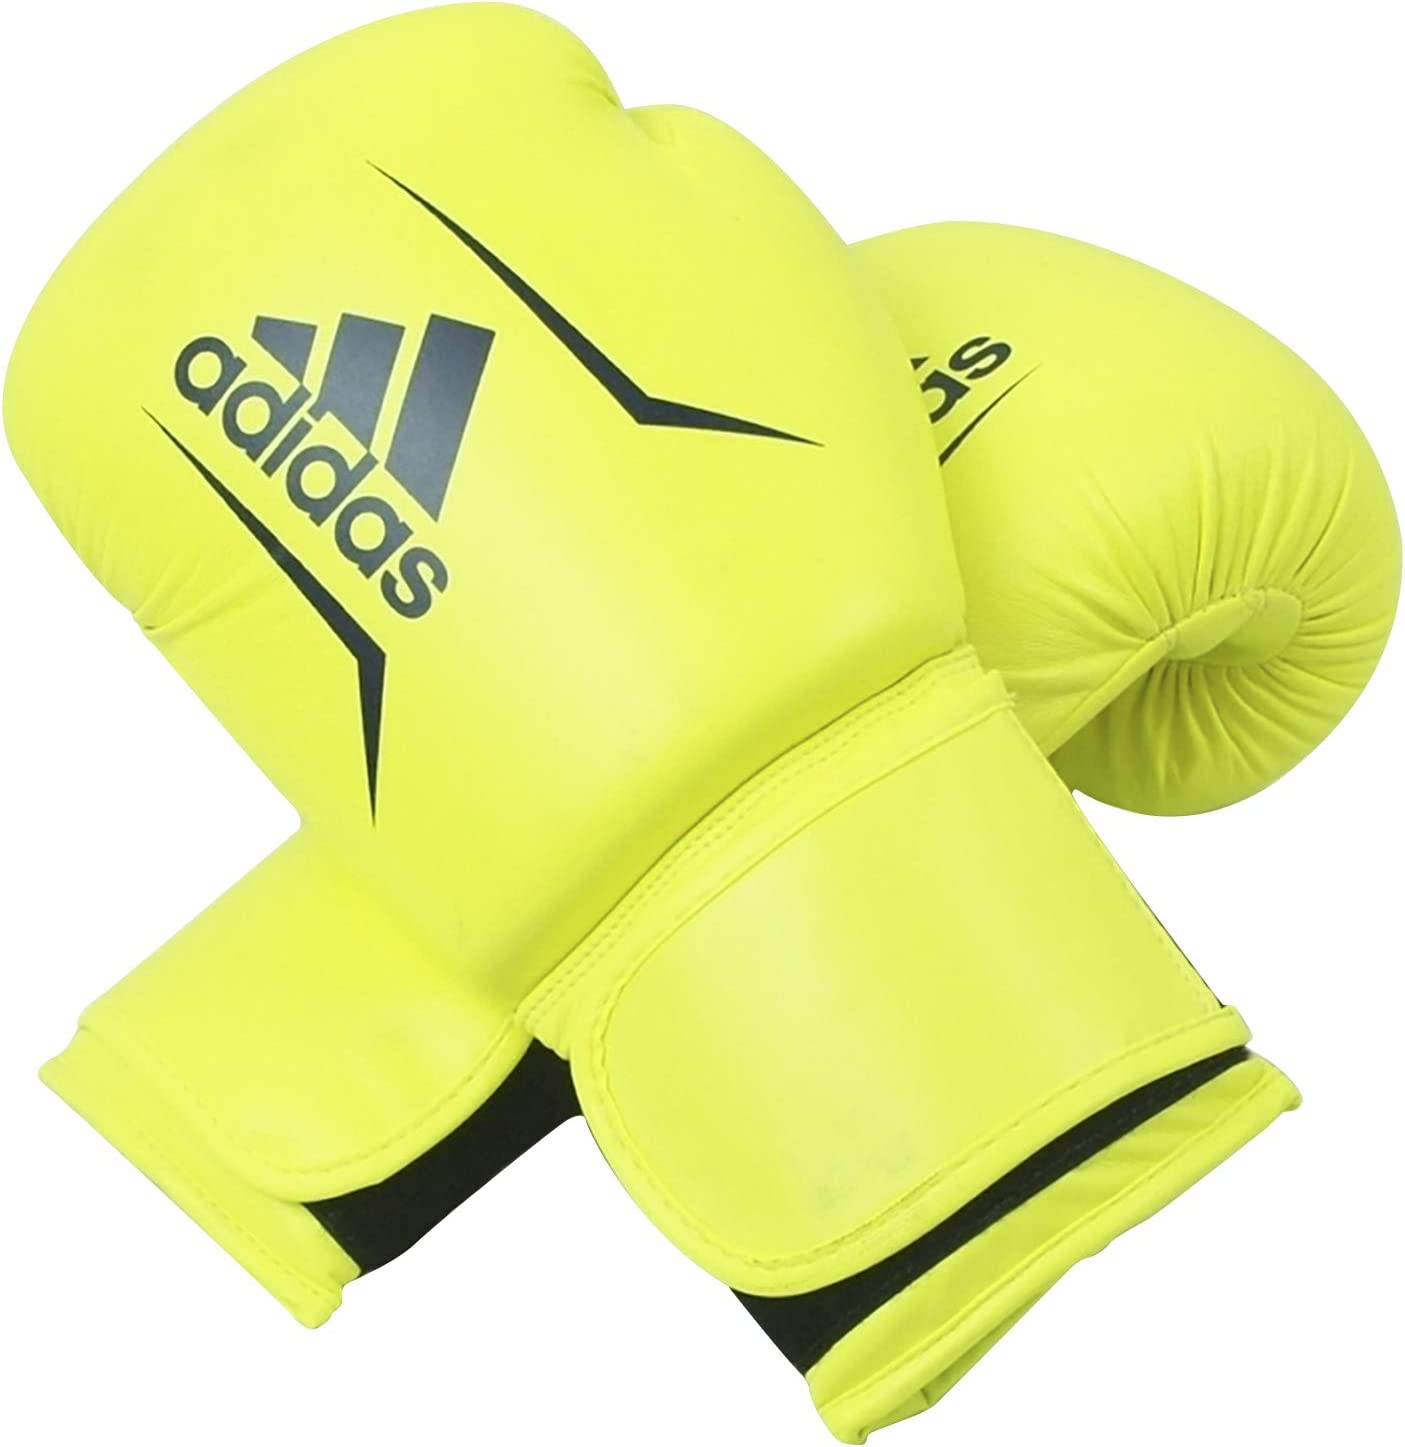 adidas Boxing Gloves - Speed 50 Boxing & Kickboxing - Boxing Gloves Women/Boxing Gloves for Men - Boxing Equipment